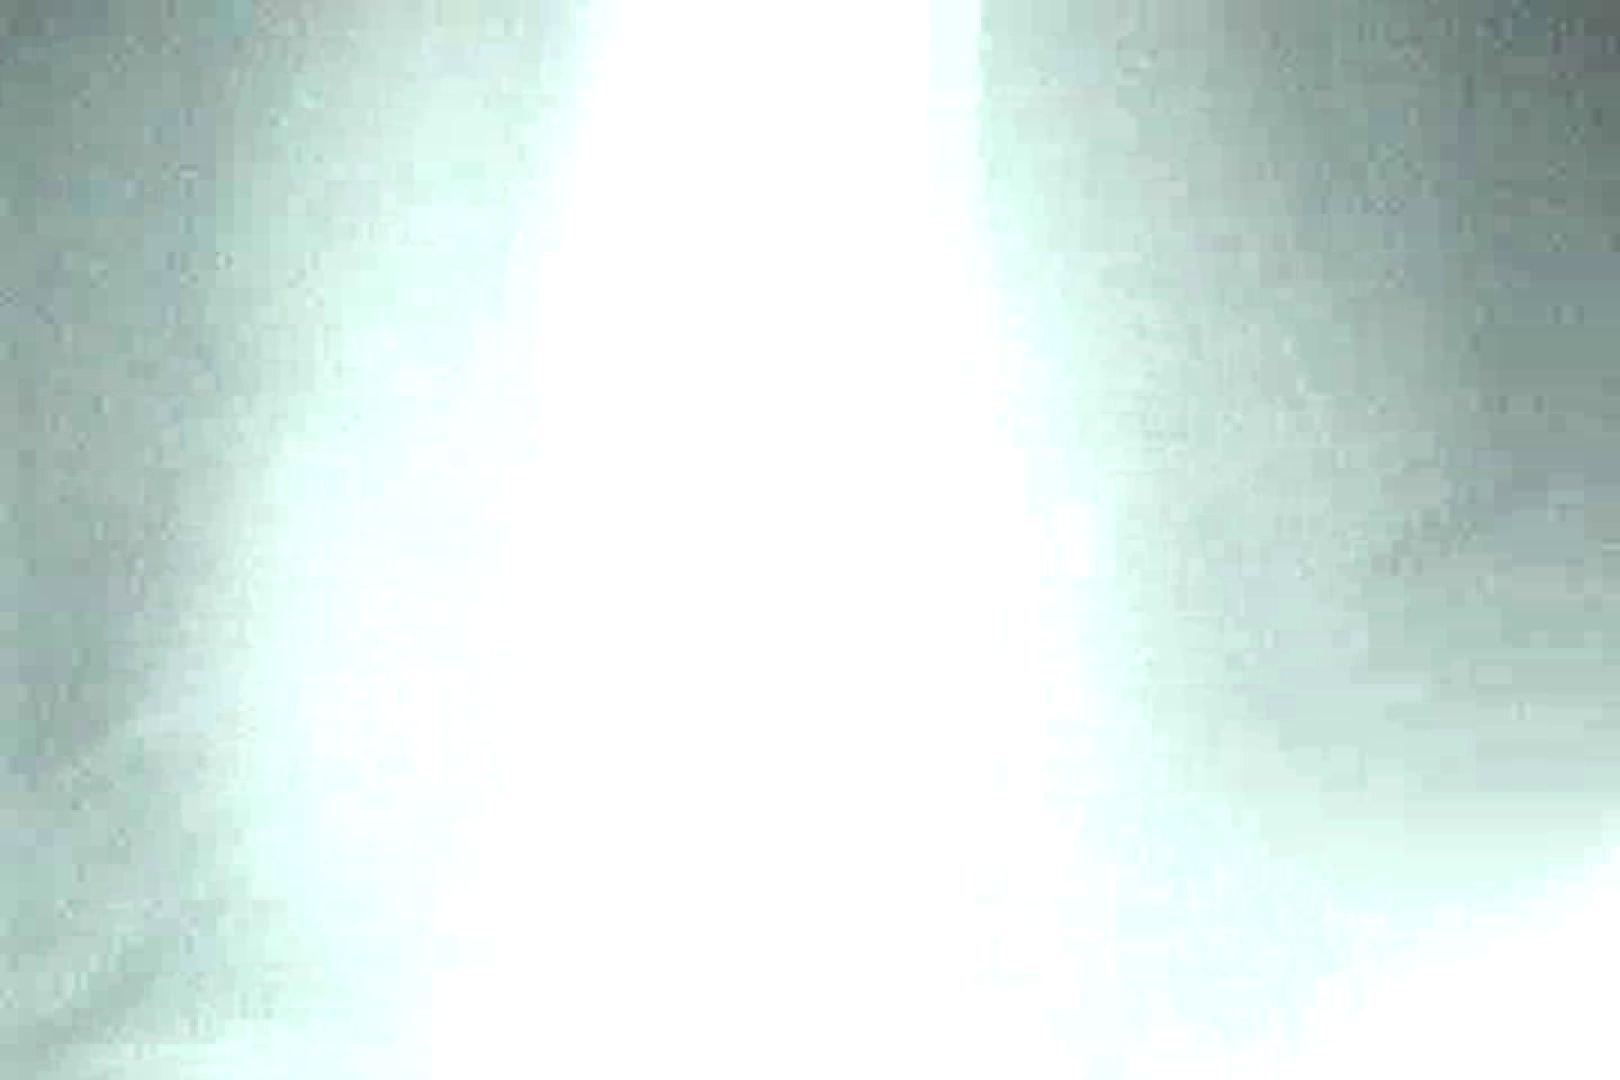 充血監督の深夜の運動会Vol.106 美女   OL女体  46連発 1